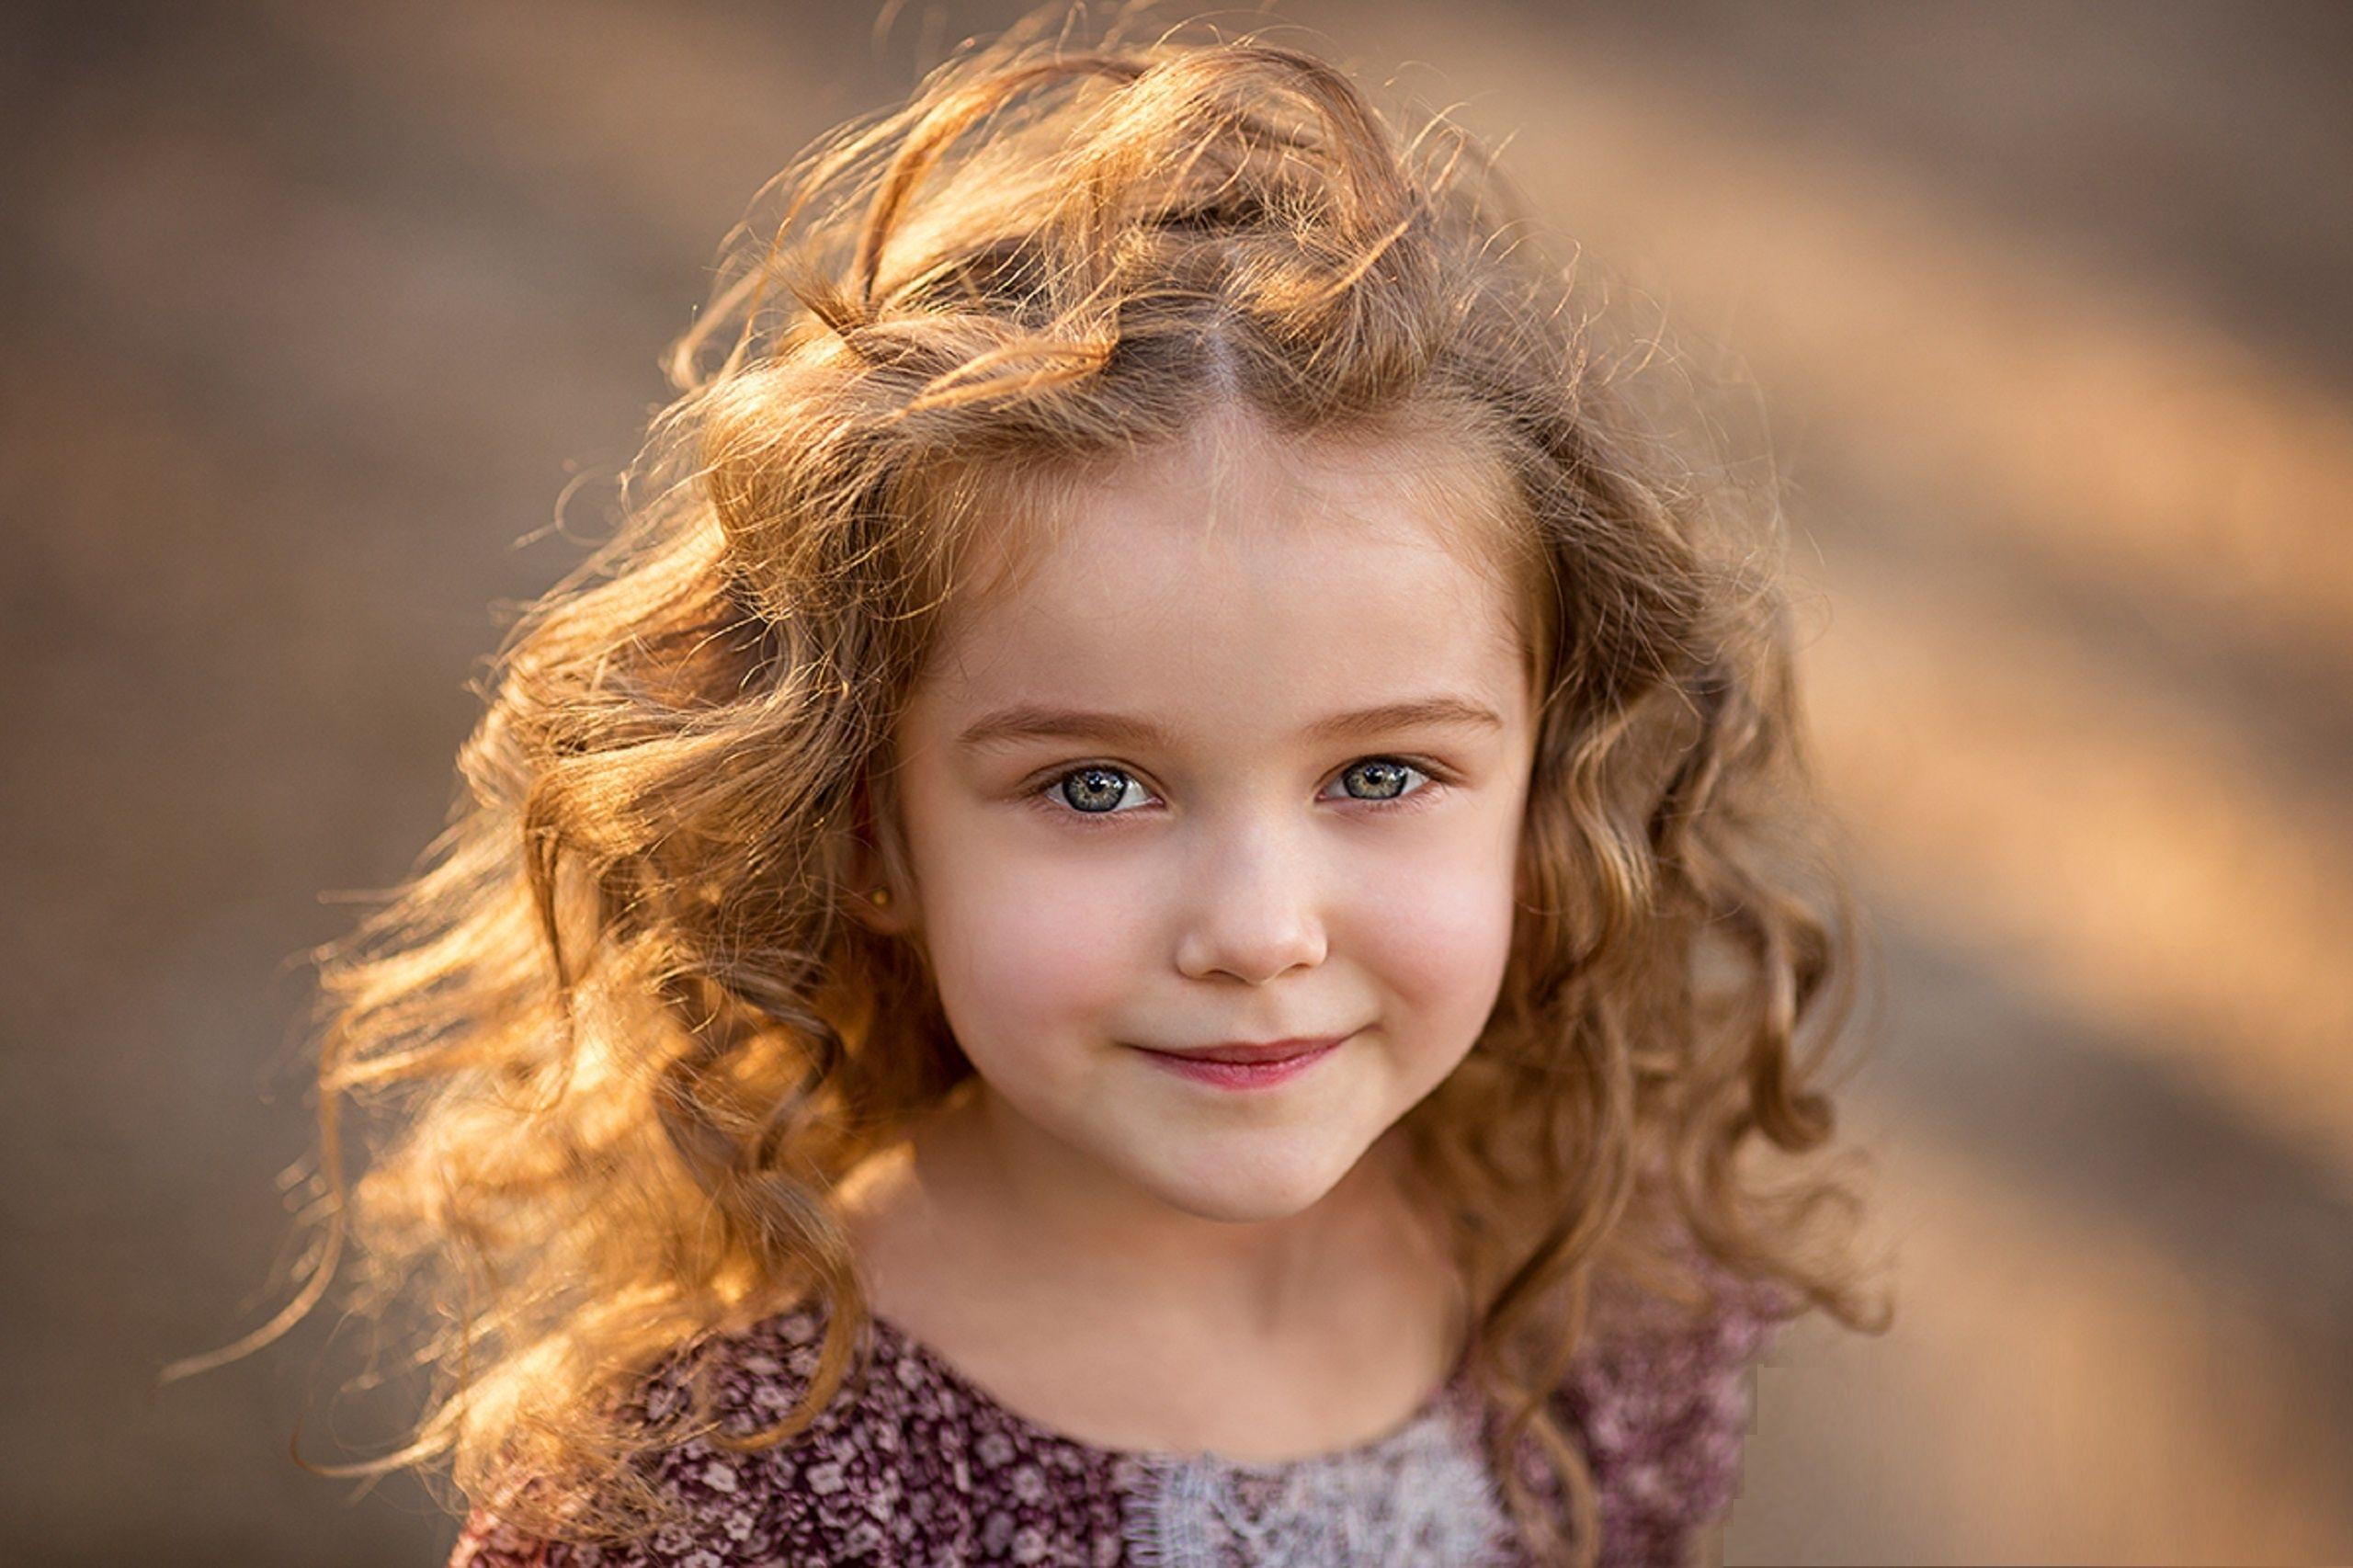 Девочка 5 лет картинки